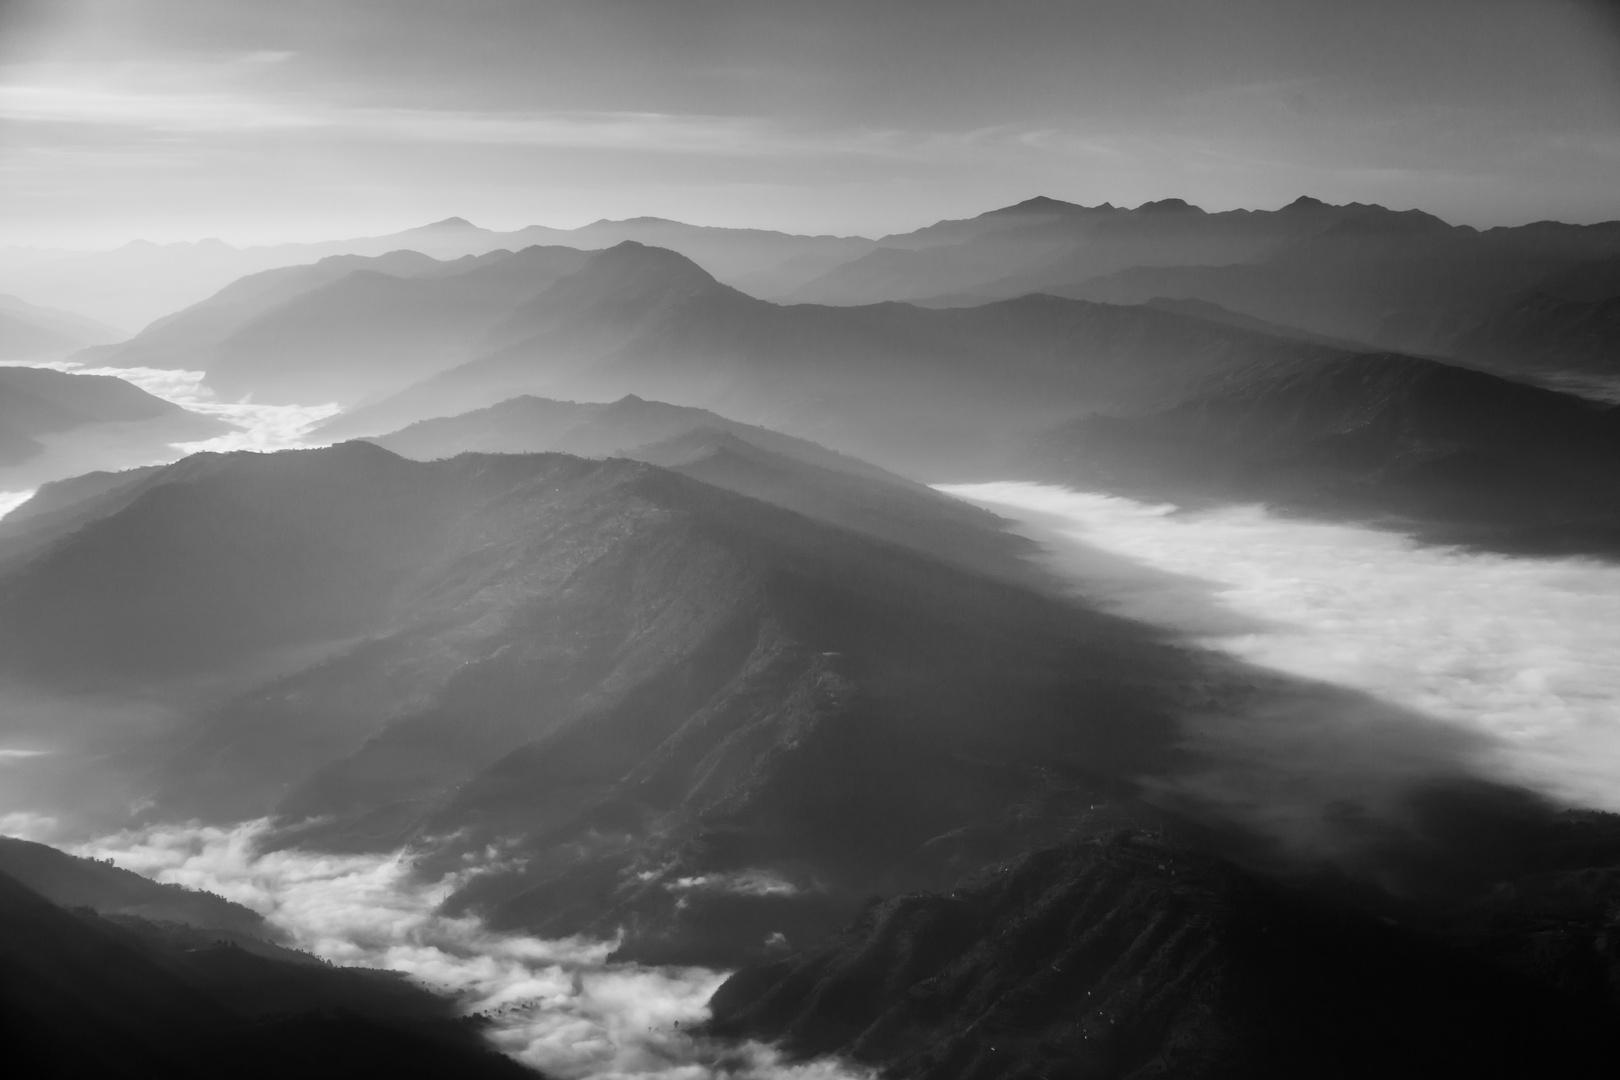 Nebel über dem Kathmandu-Tal